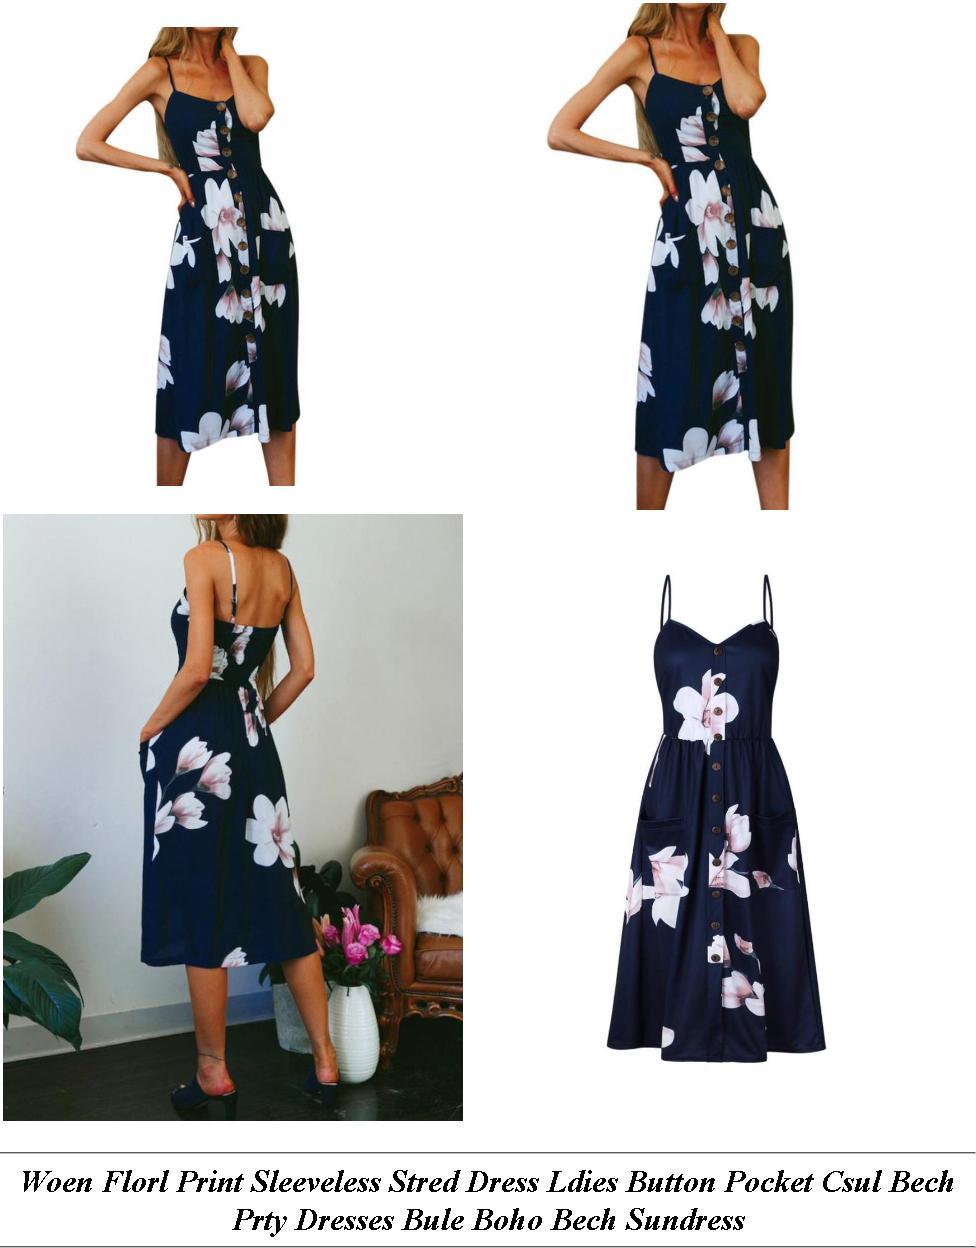 Polka Dot Dress Lue - Cheap Womens Clothes Sale - J Lo Green Dress Grammys